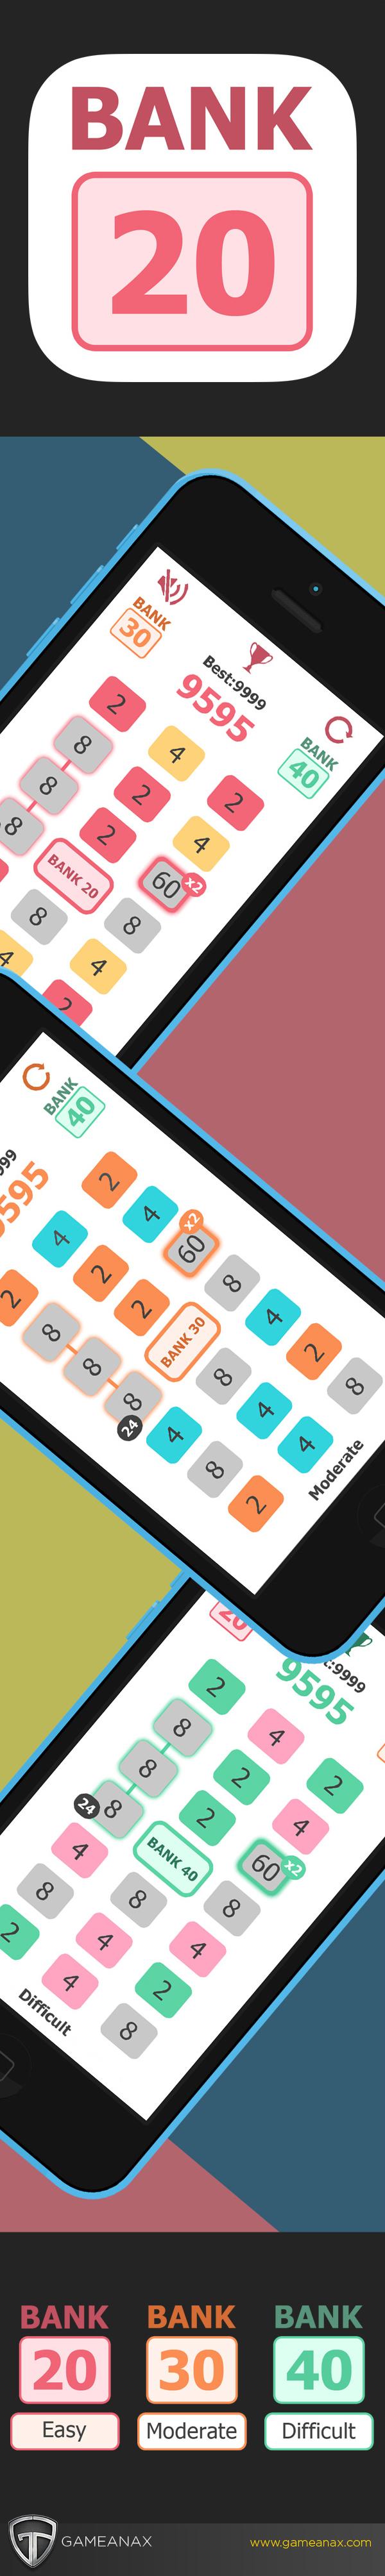 mobile gaming UI Gaming Games puzzle iphone iPad